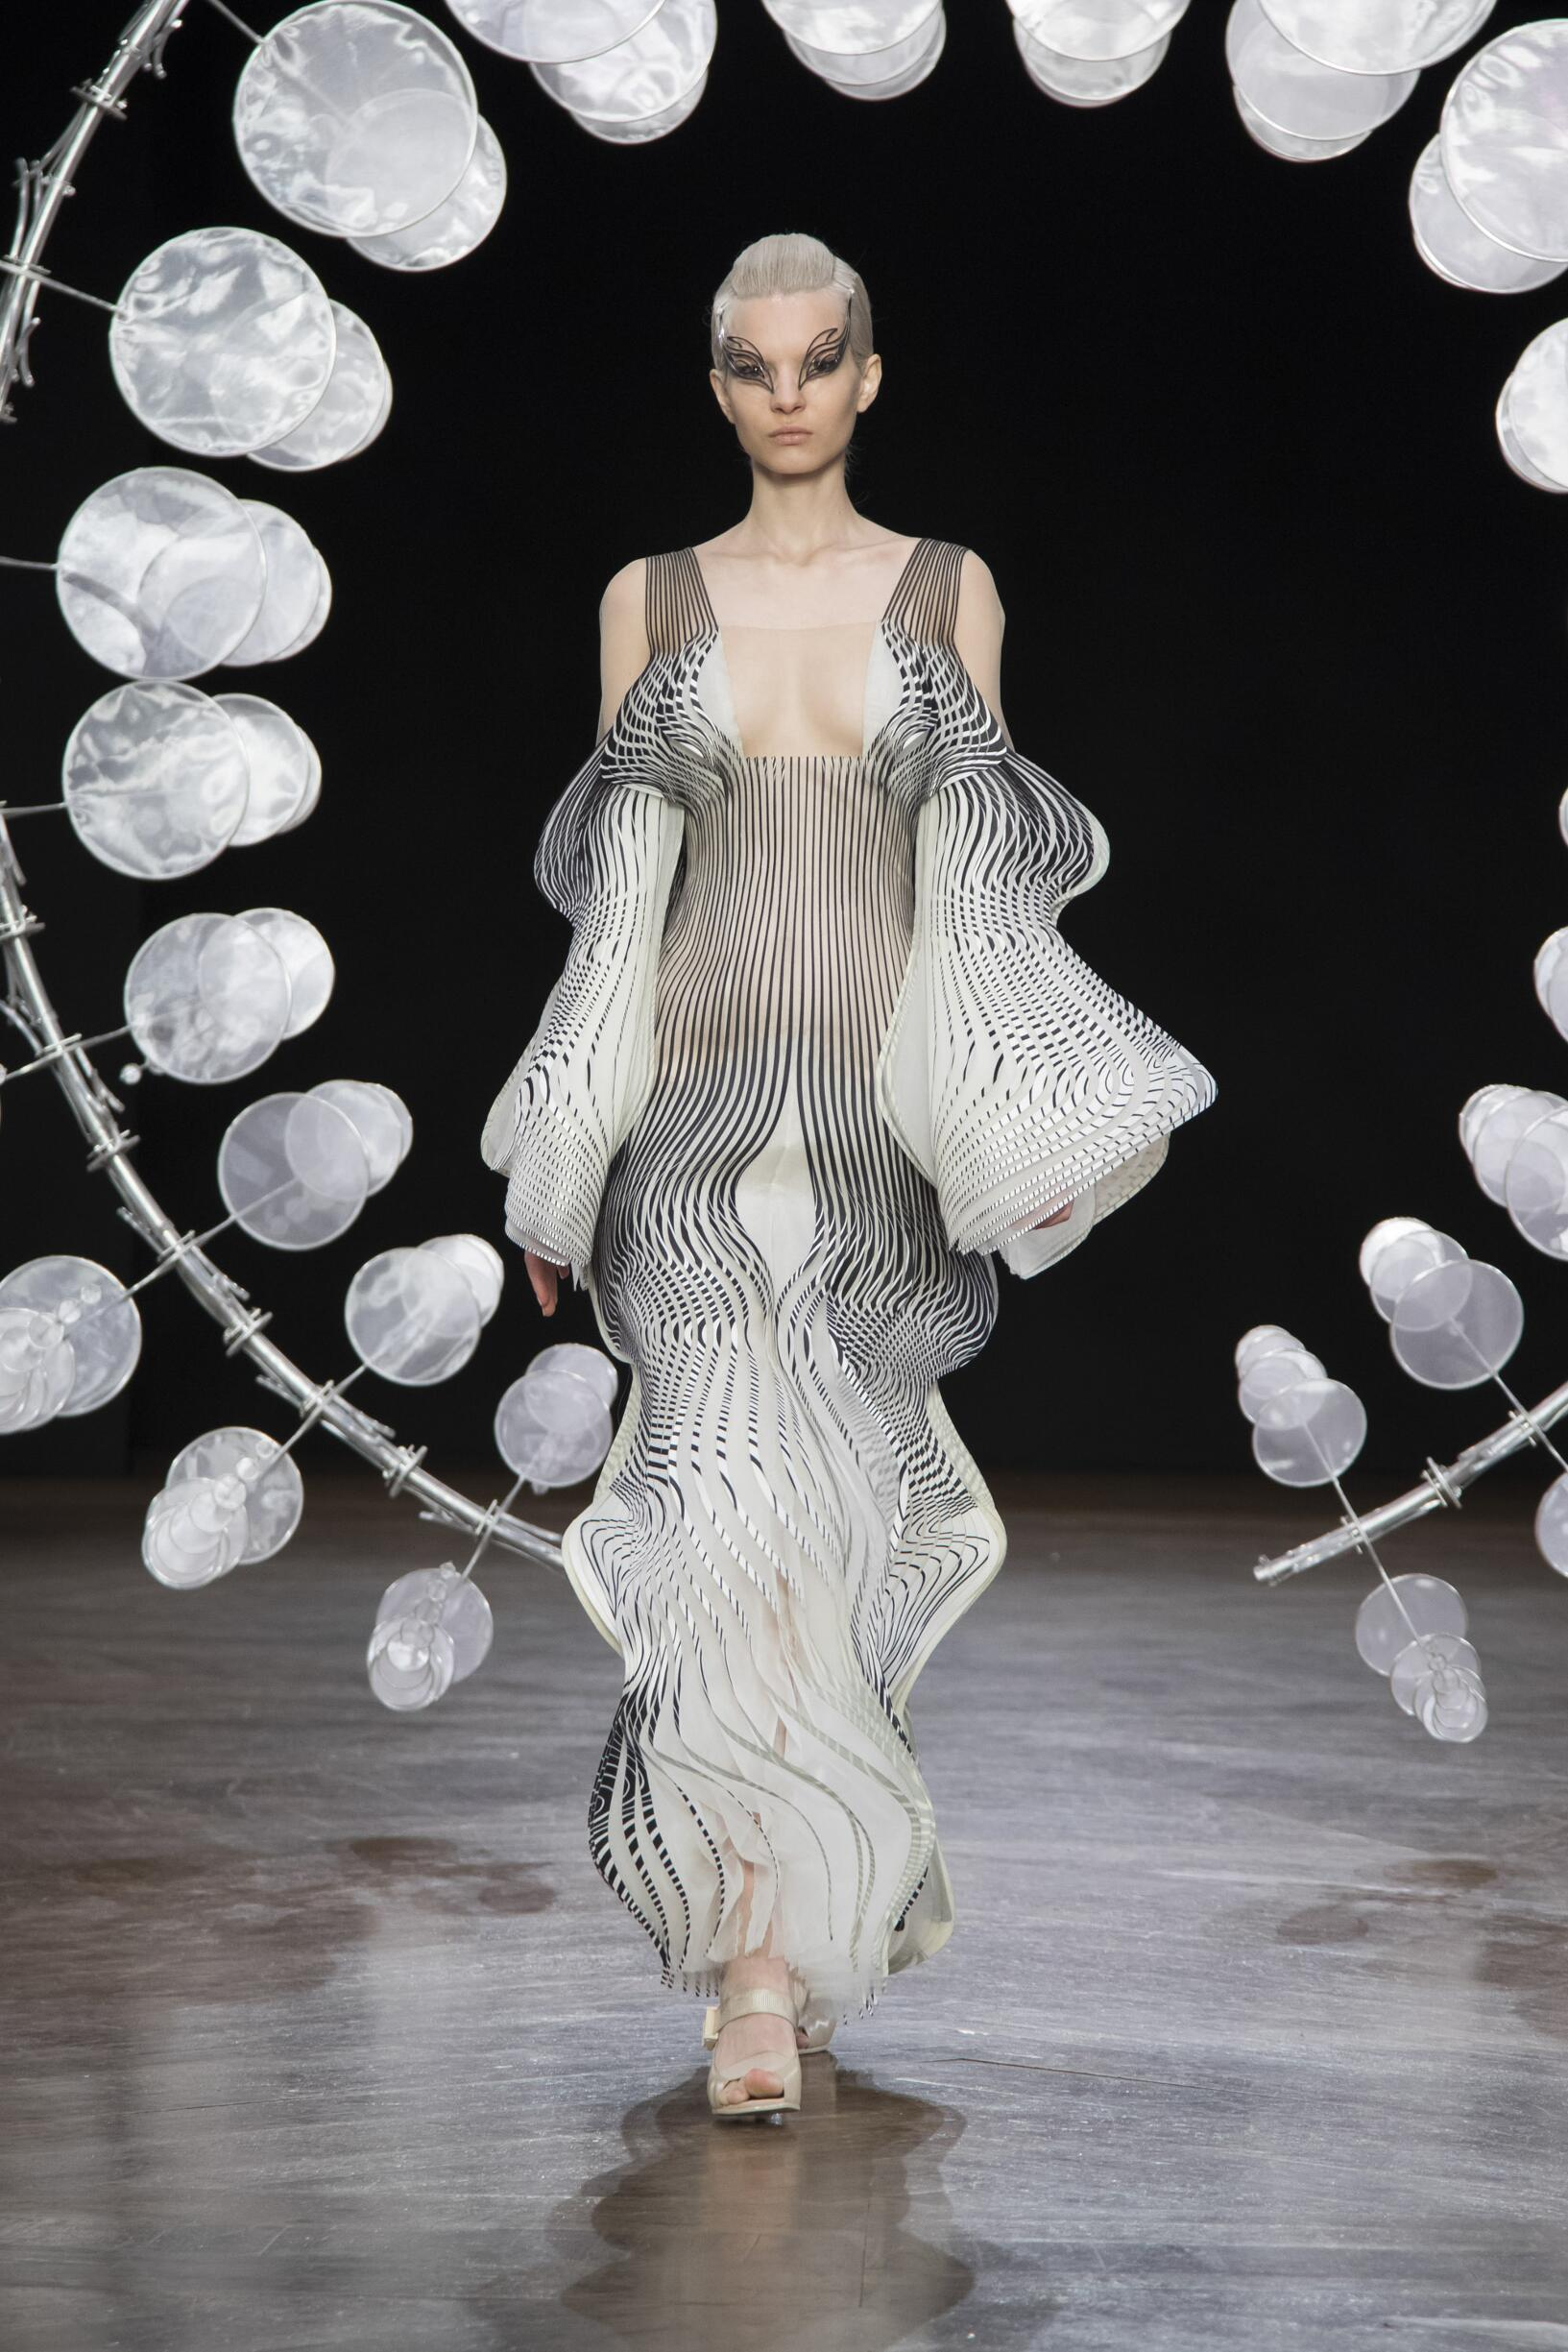 FW 2019-20 Fashion Show Iris van Herpen Haute Couture